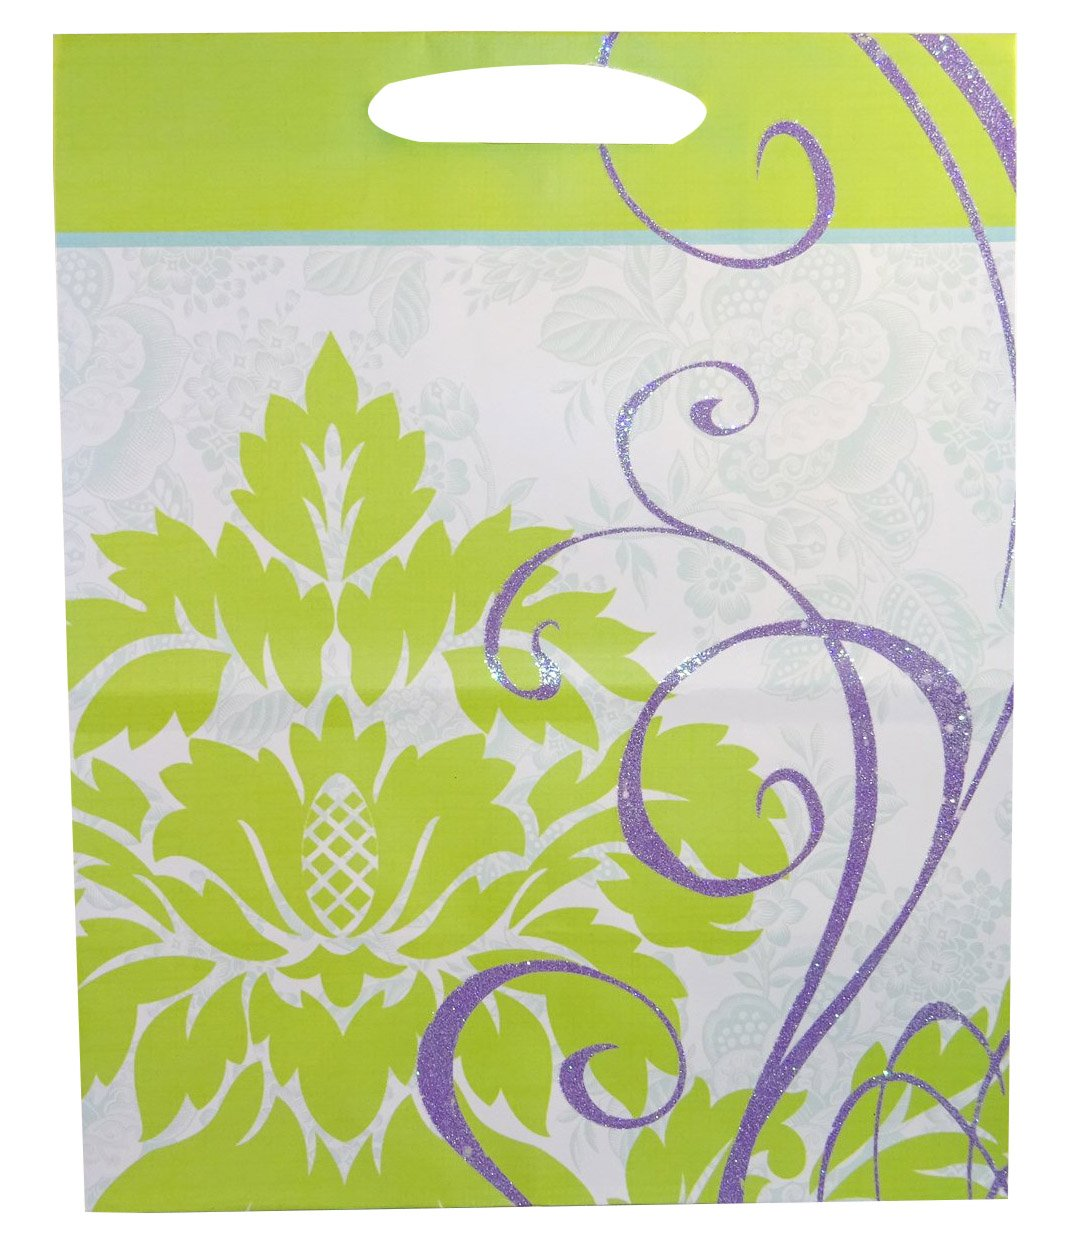 Hallmark Sparkle Lavender Gift Bags, Green